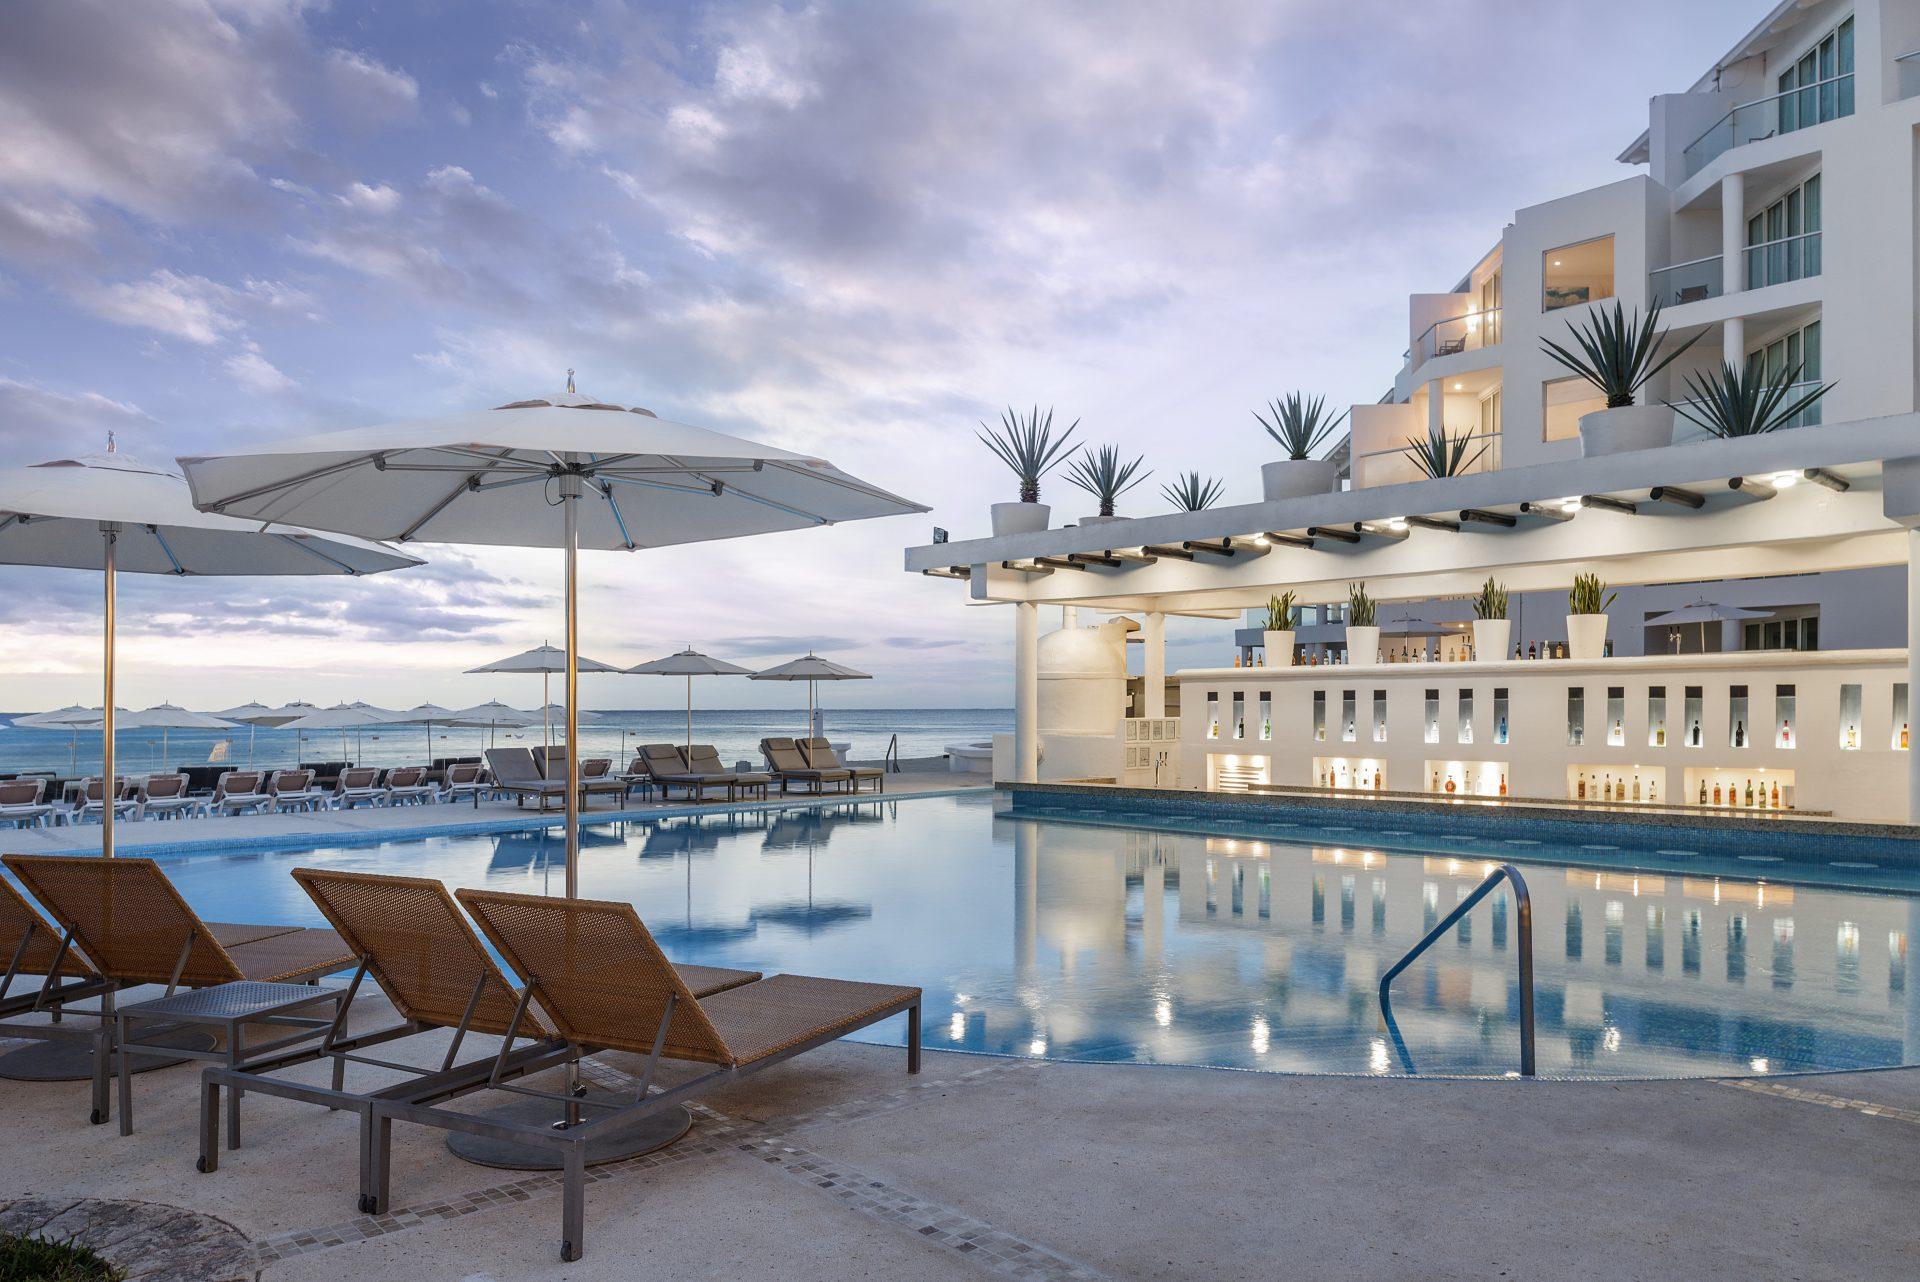 Playacar Palace: vista da piscina, do bar molhado, do mar de Playa del Carmen, tendo ao fundo o hotel